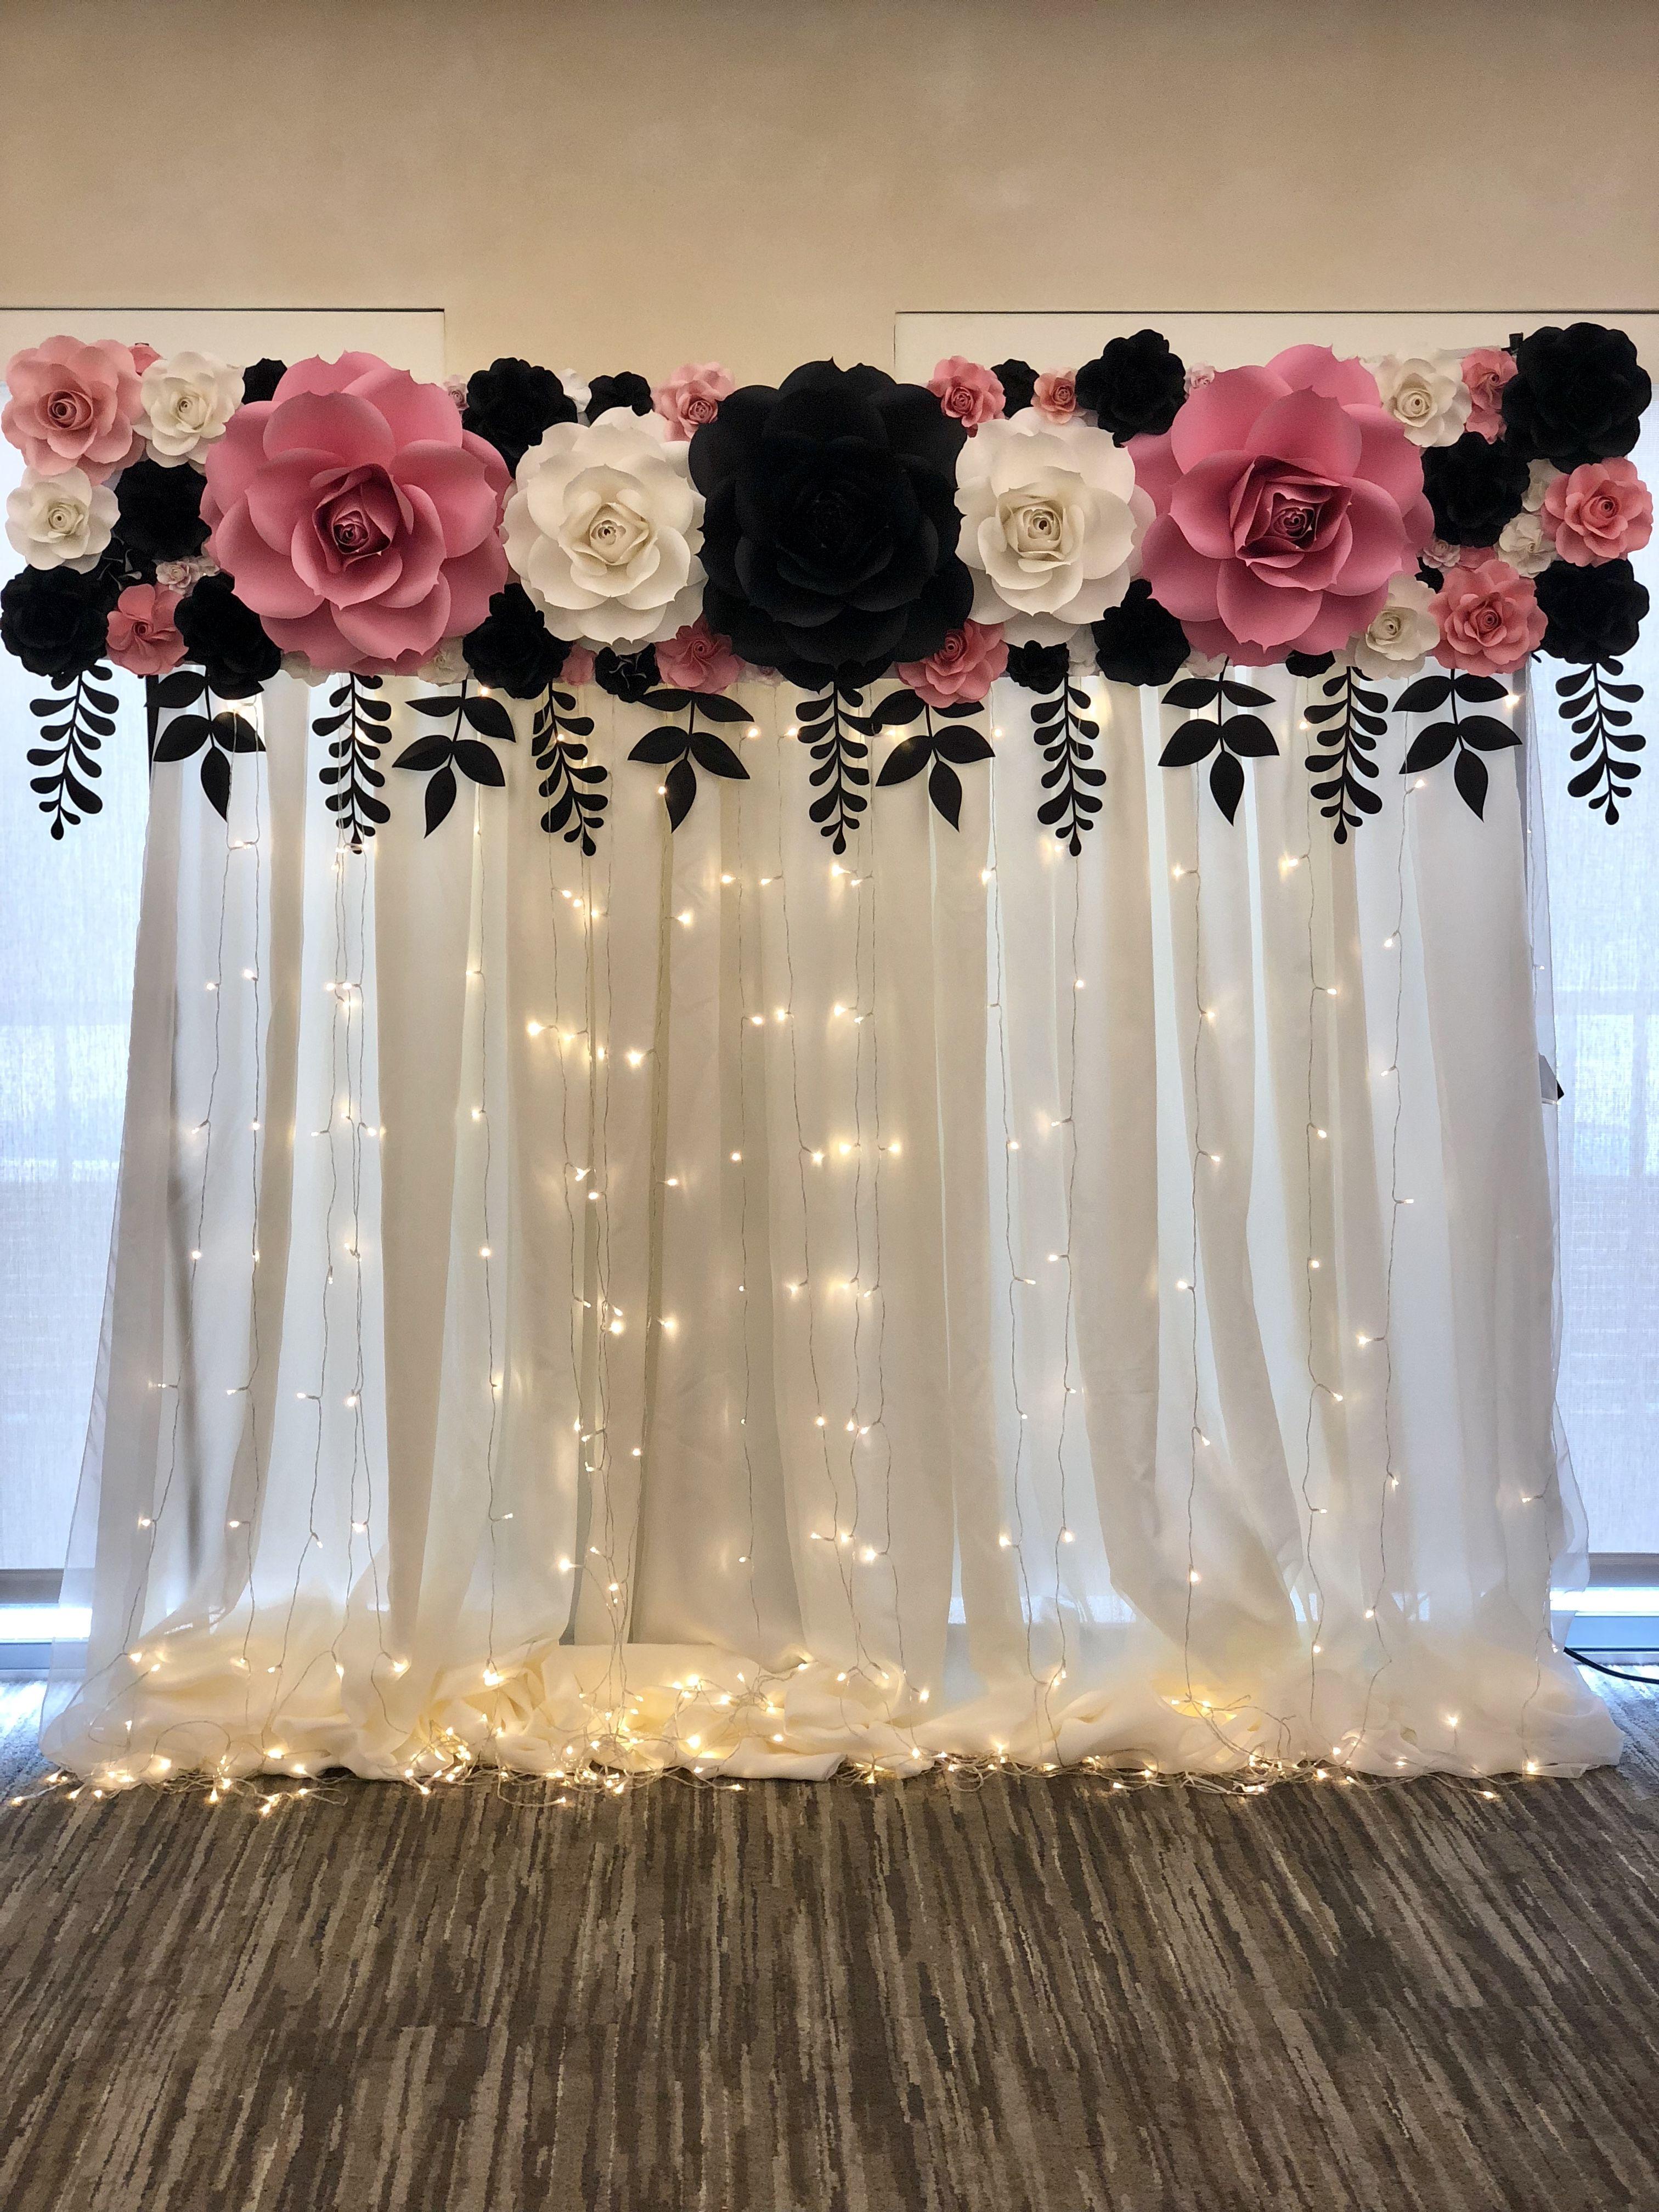 Paper Flower Backdrop Quinceanera Decorations Party Decorations Wedding Decorations